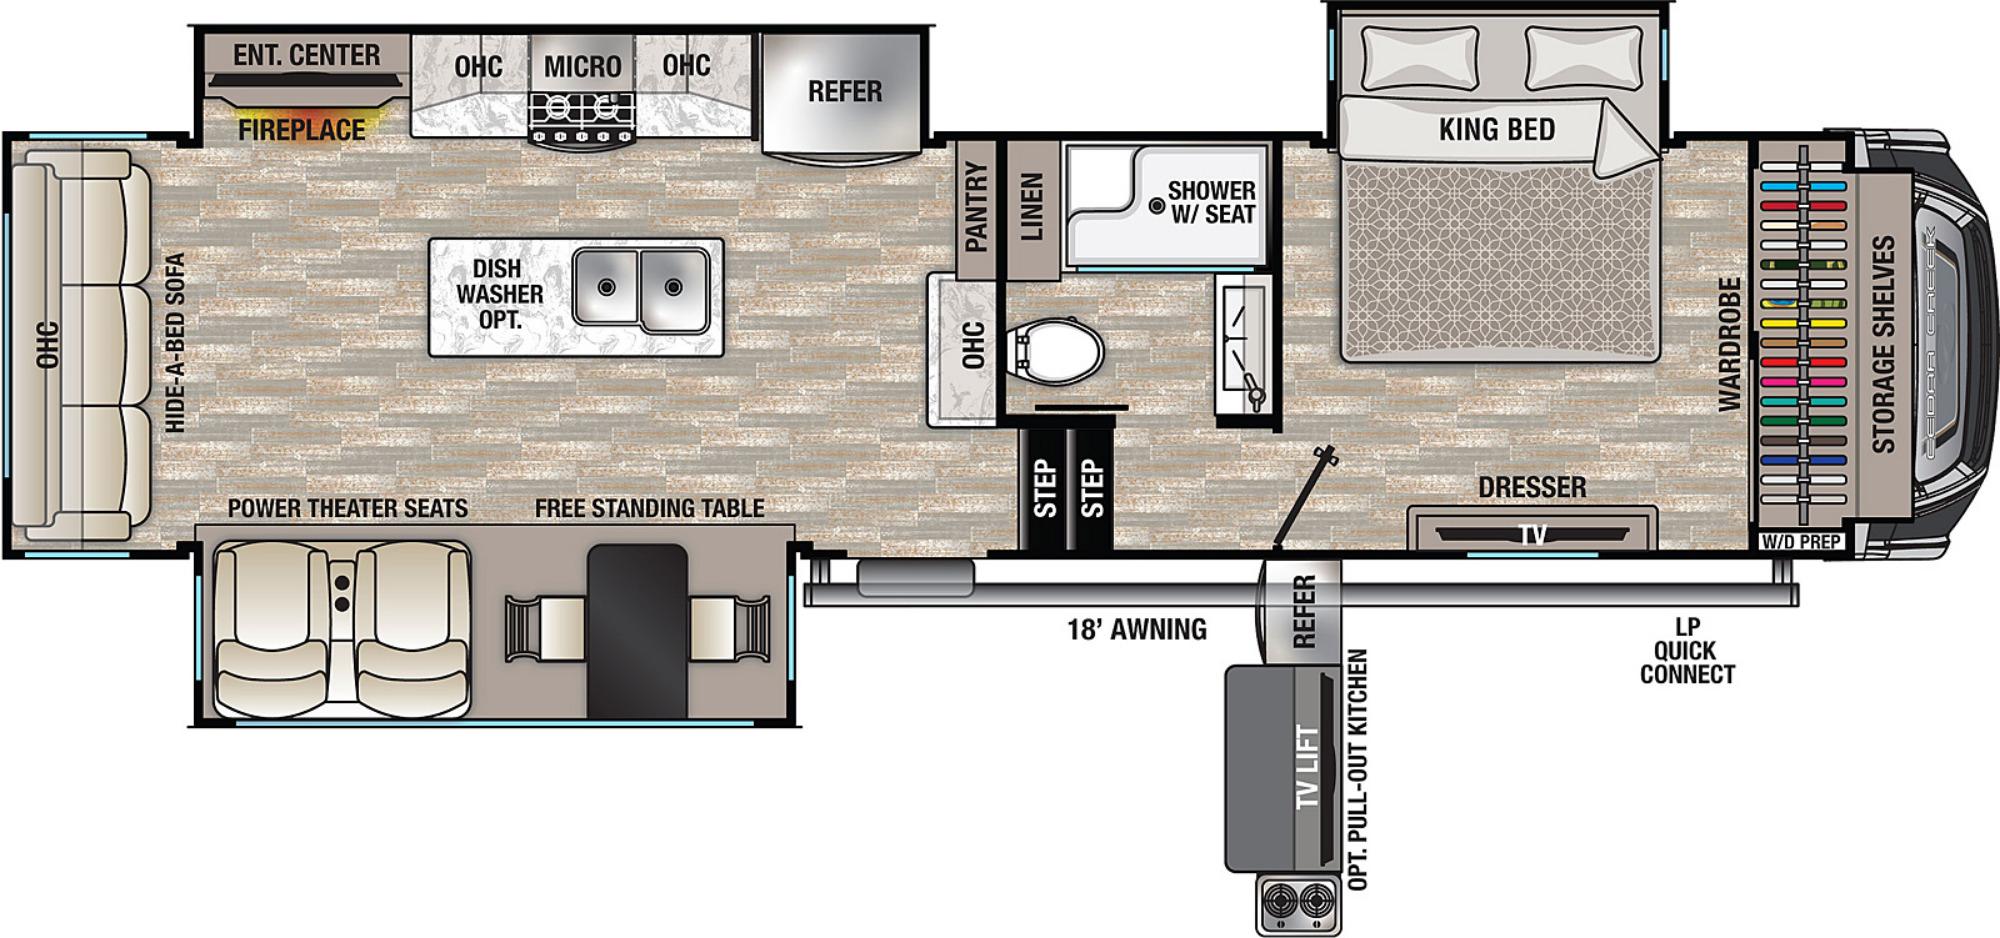 View Floor Plan for 2021 FOREST RIVER CEDAR CREEK 311RL